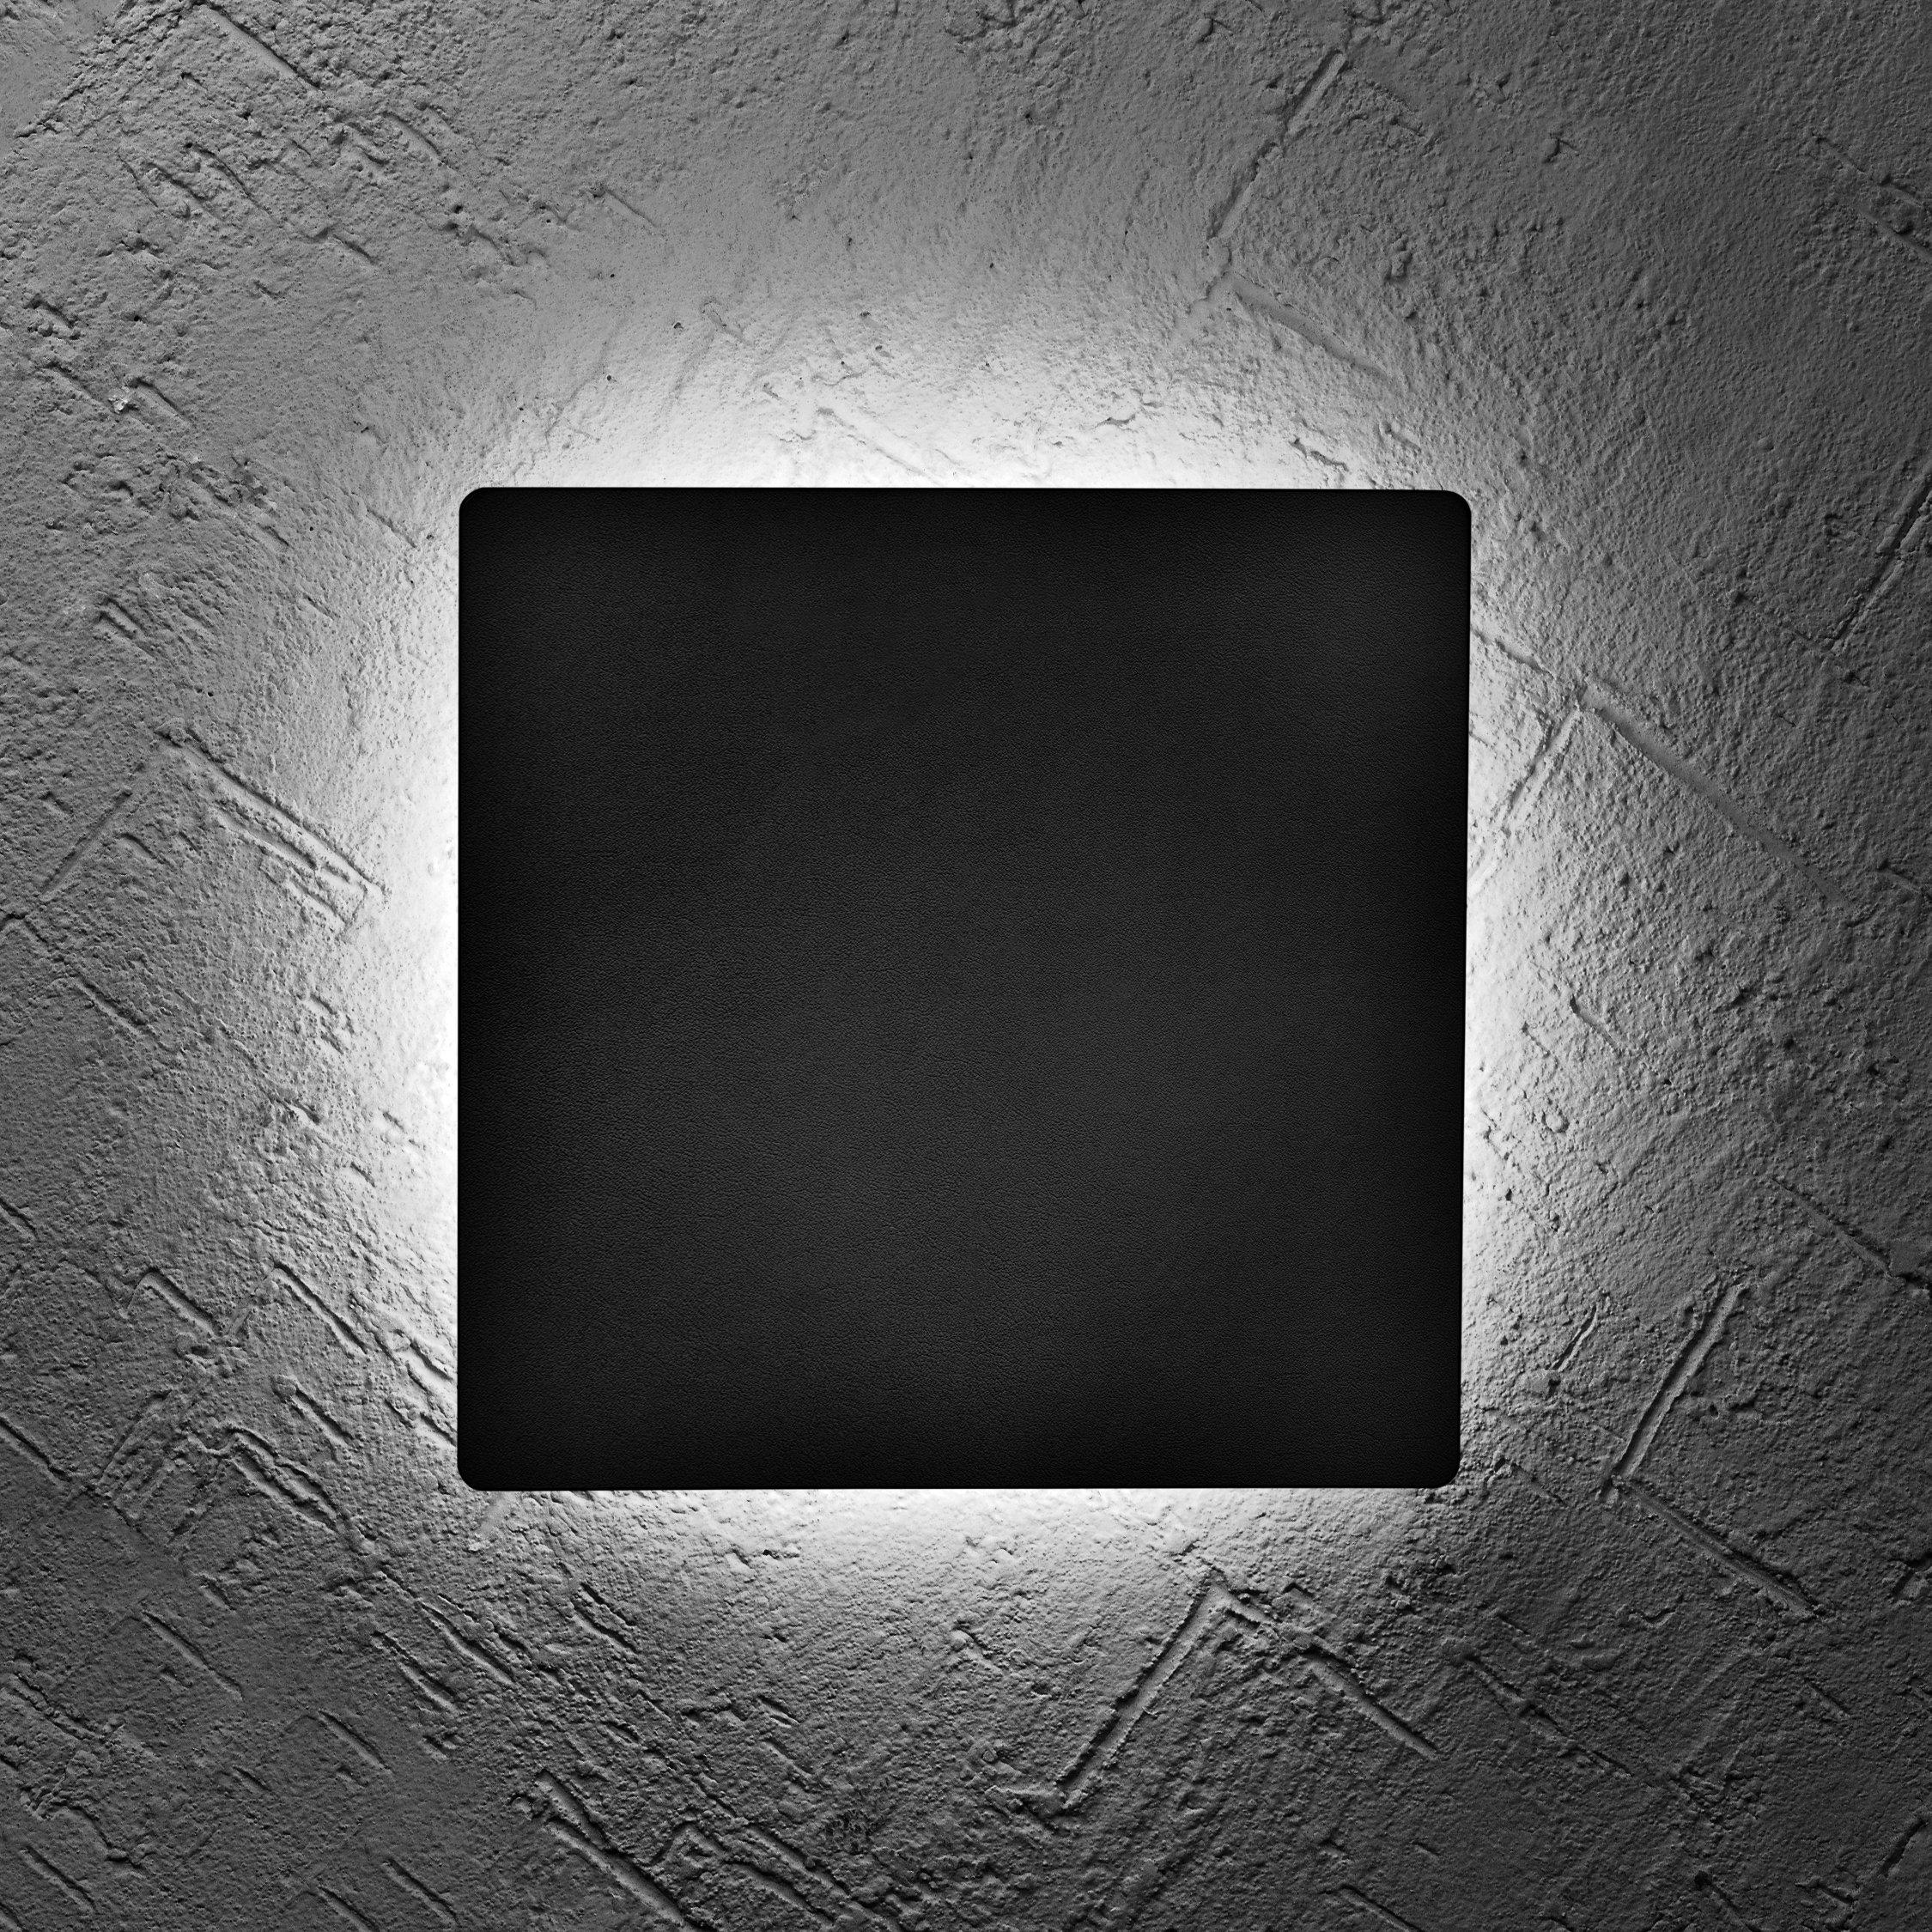 Hyperikon LED Porch Sconce Square Light 6W, Black Modern Wall Mount, 500 lumen, 4000K (Daylight Glow) Outdoor Wall Lamp with Circular Light Beam